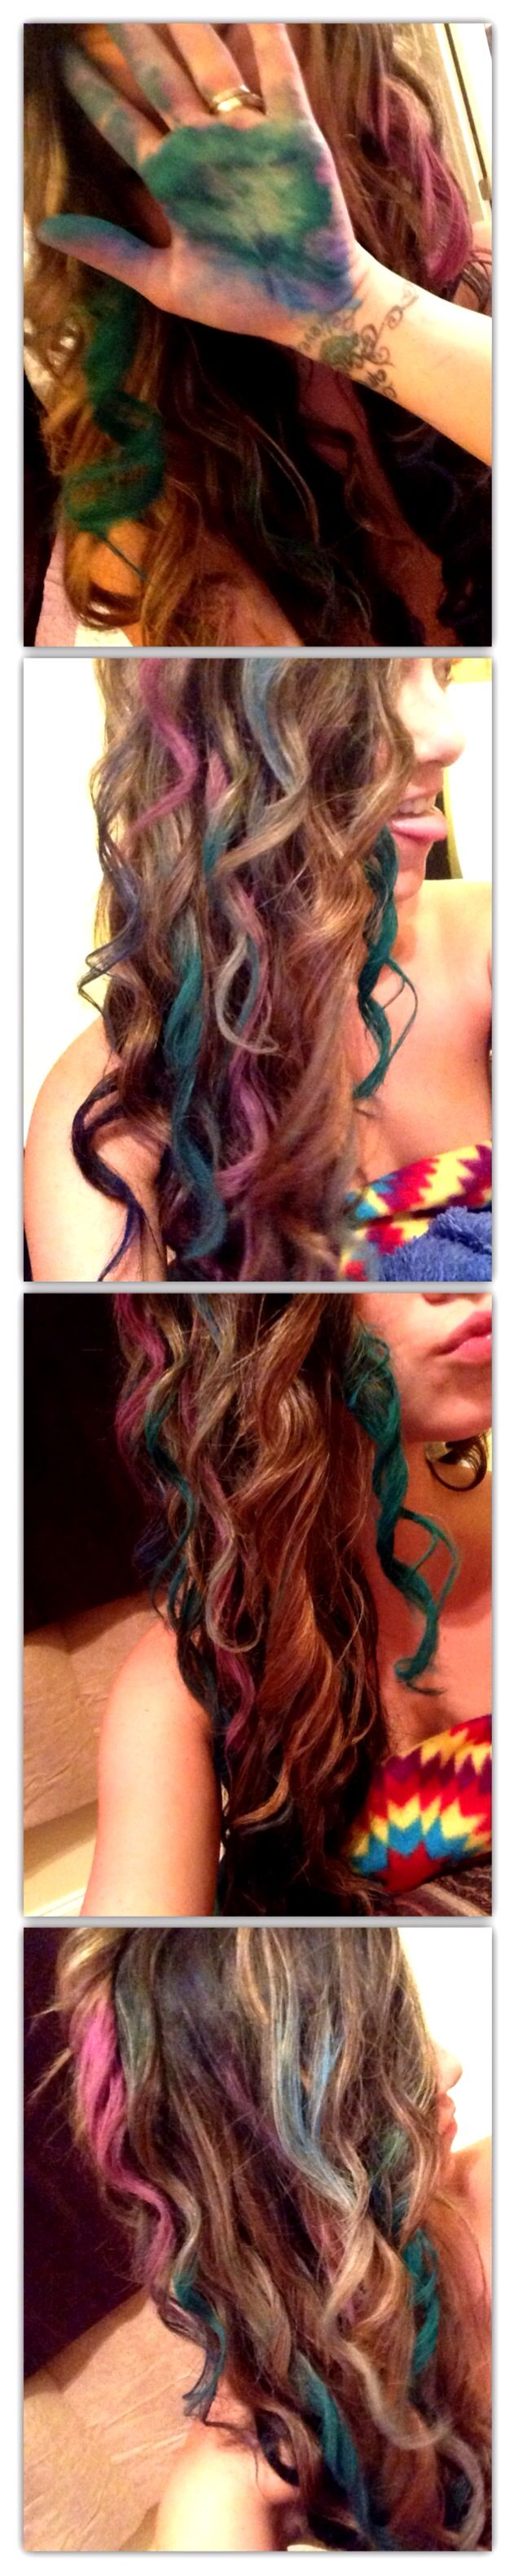 Turquoise Hair Dye Sally Beauty Supply